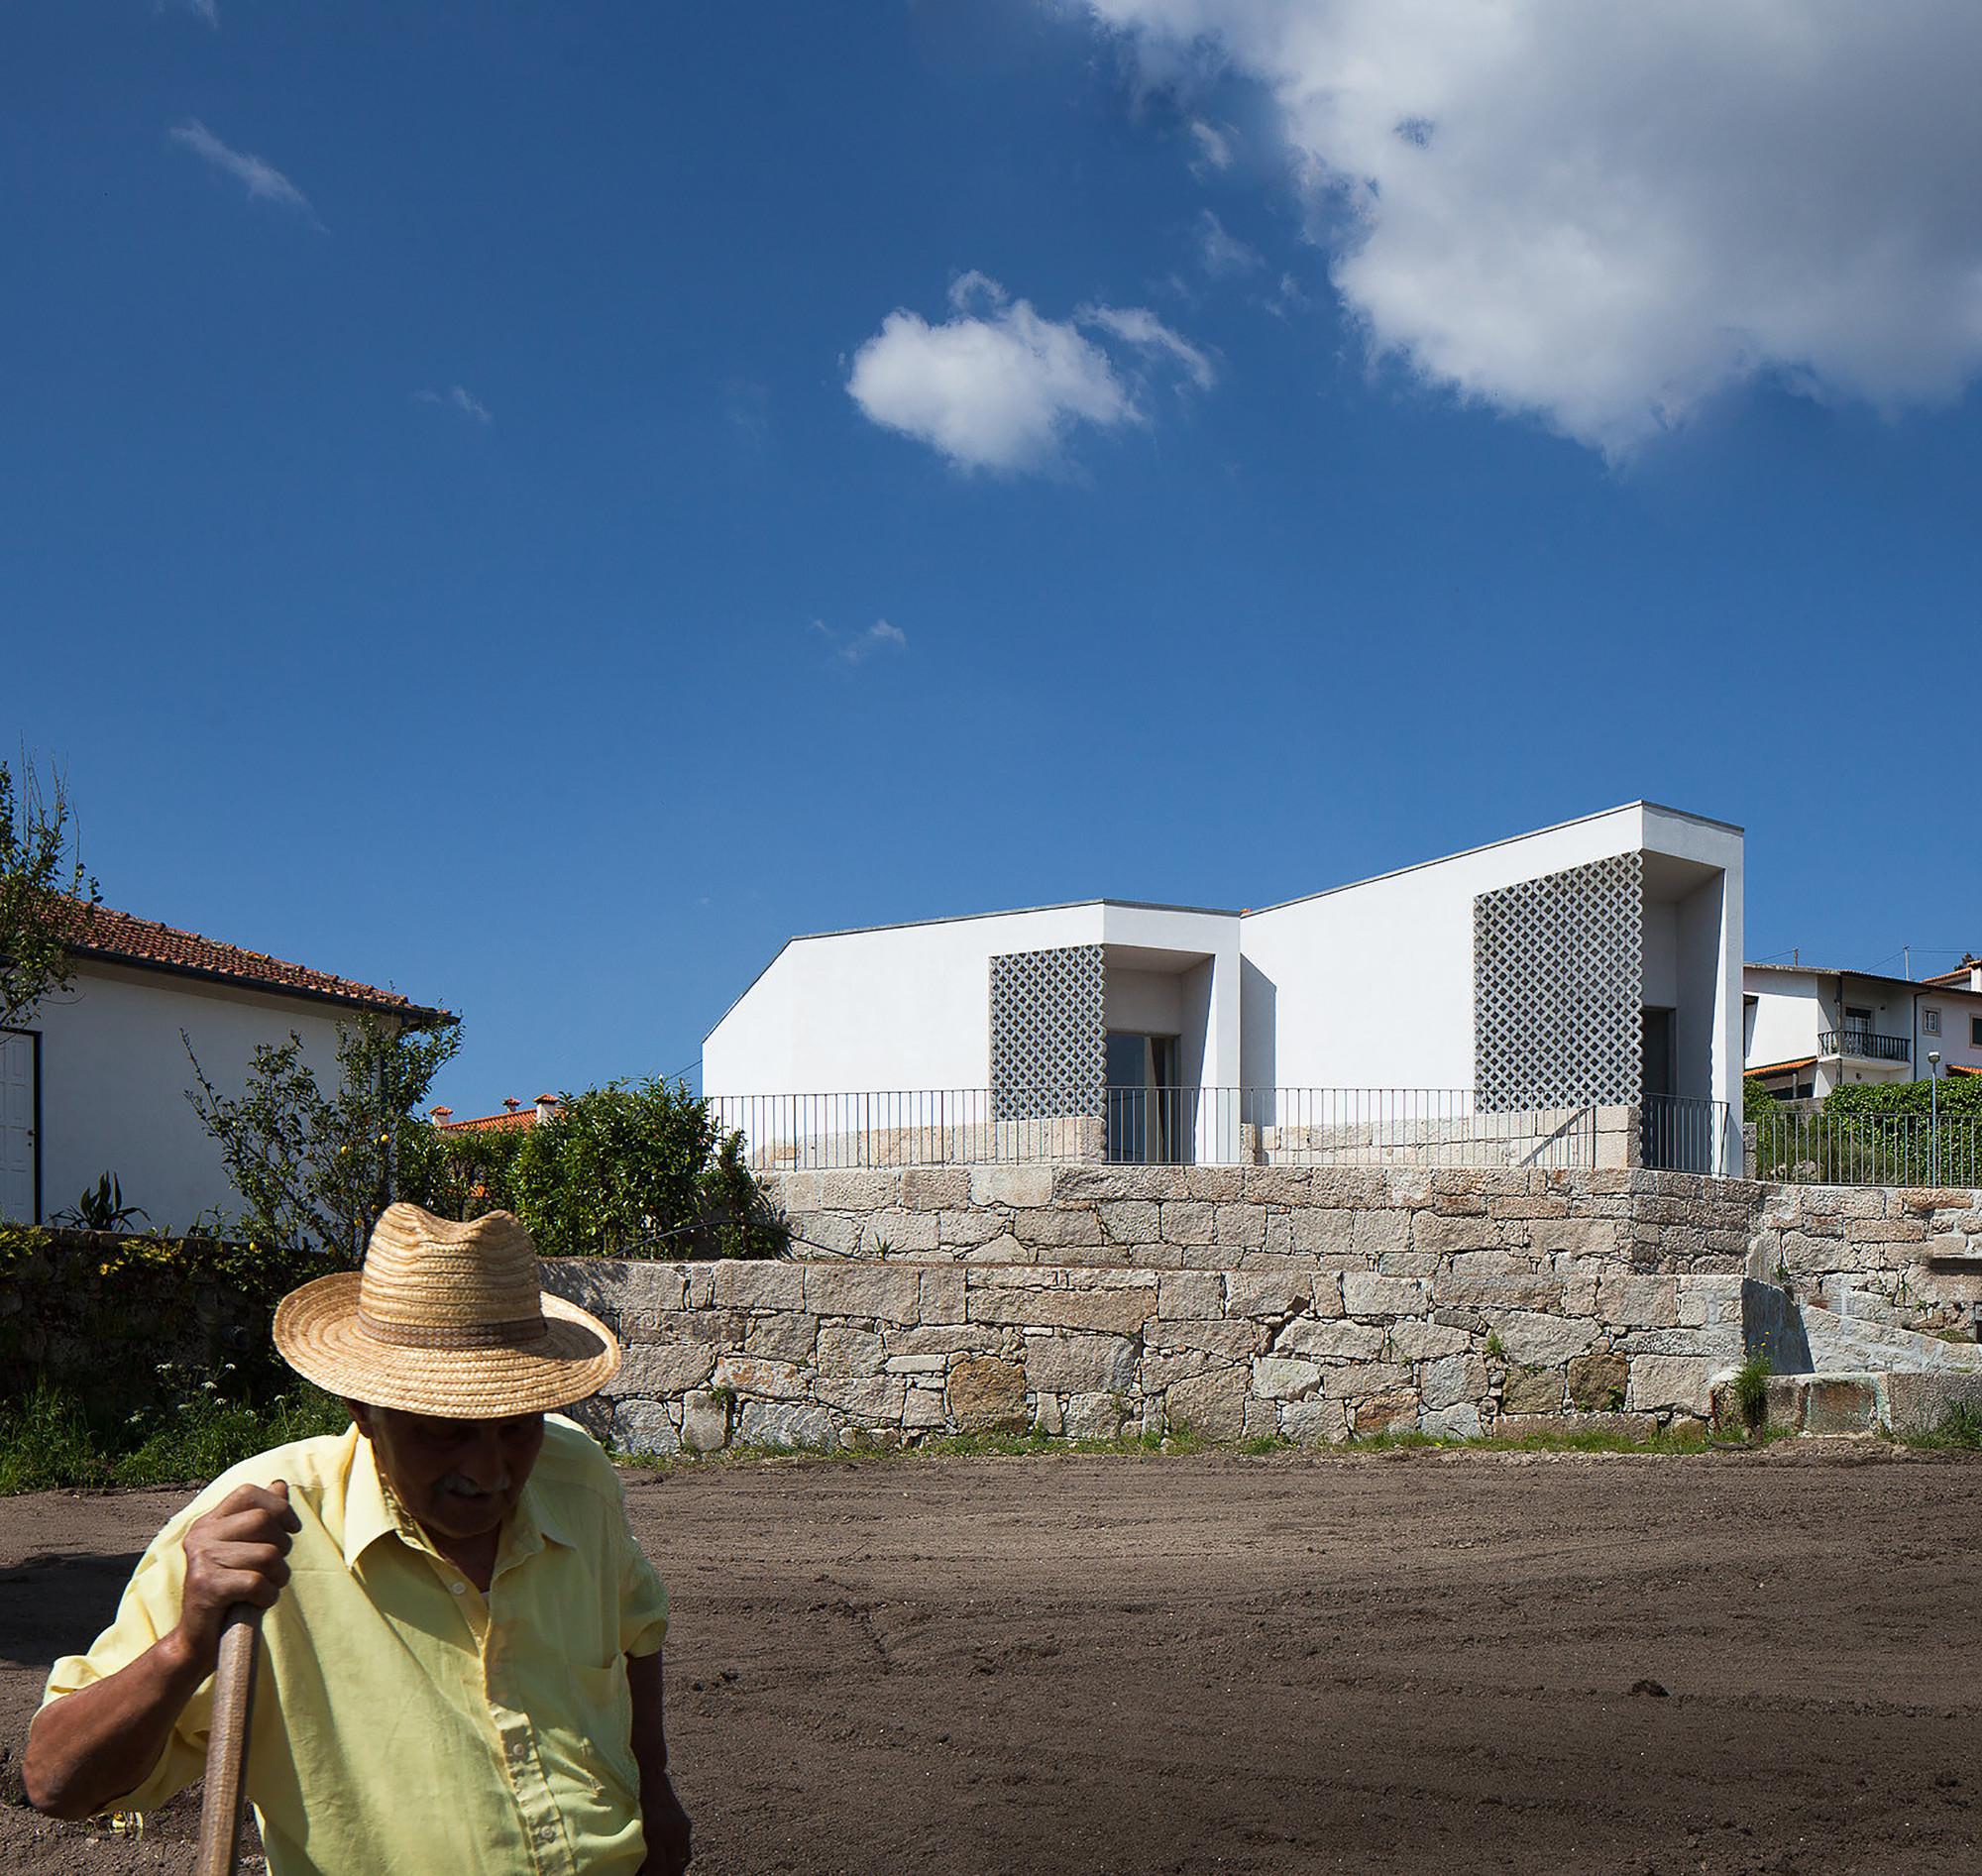 Mortuary House in Vila Caiz / Raul Sousa Cardoso + Graça Vaz